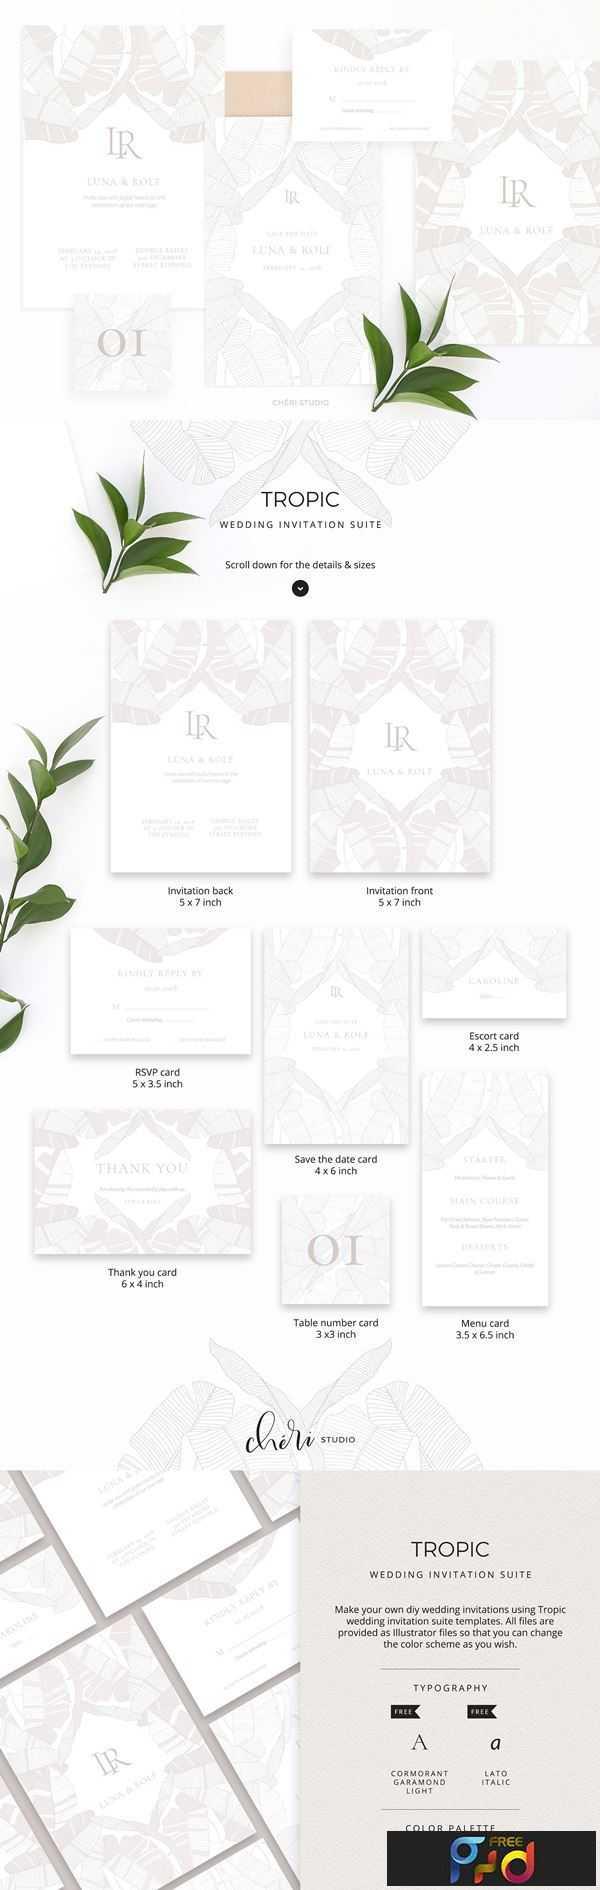 1806237 Tropic Wedding Suite 2515034 1